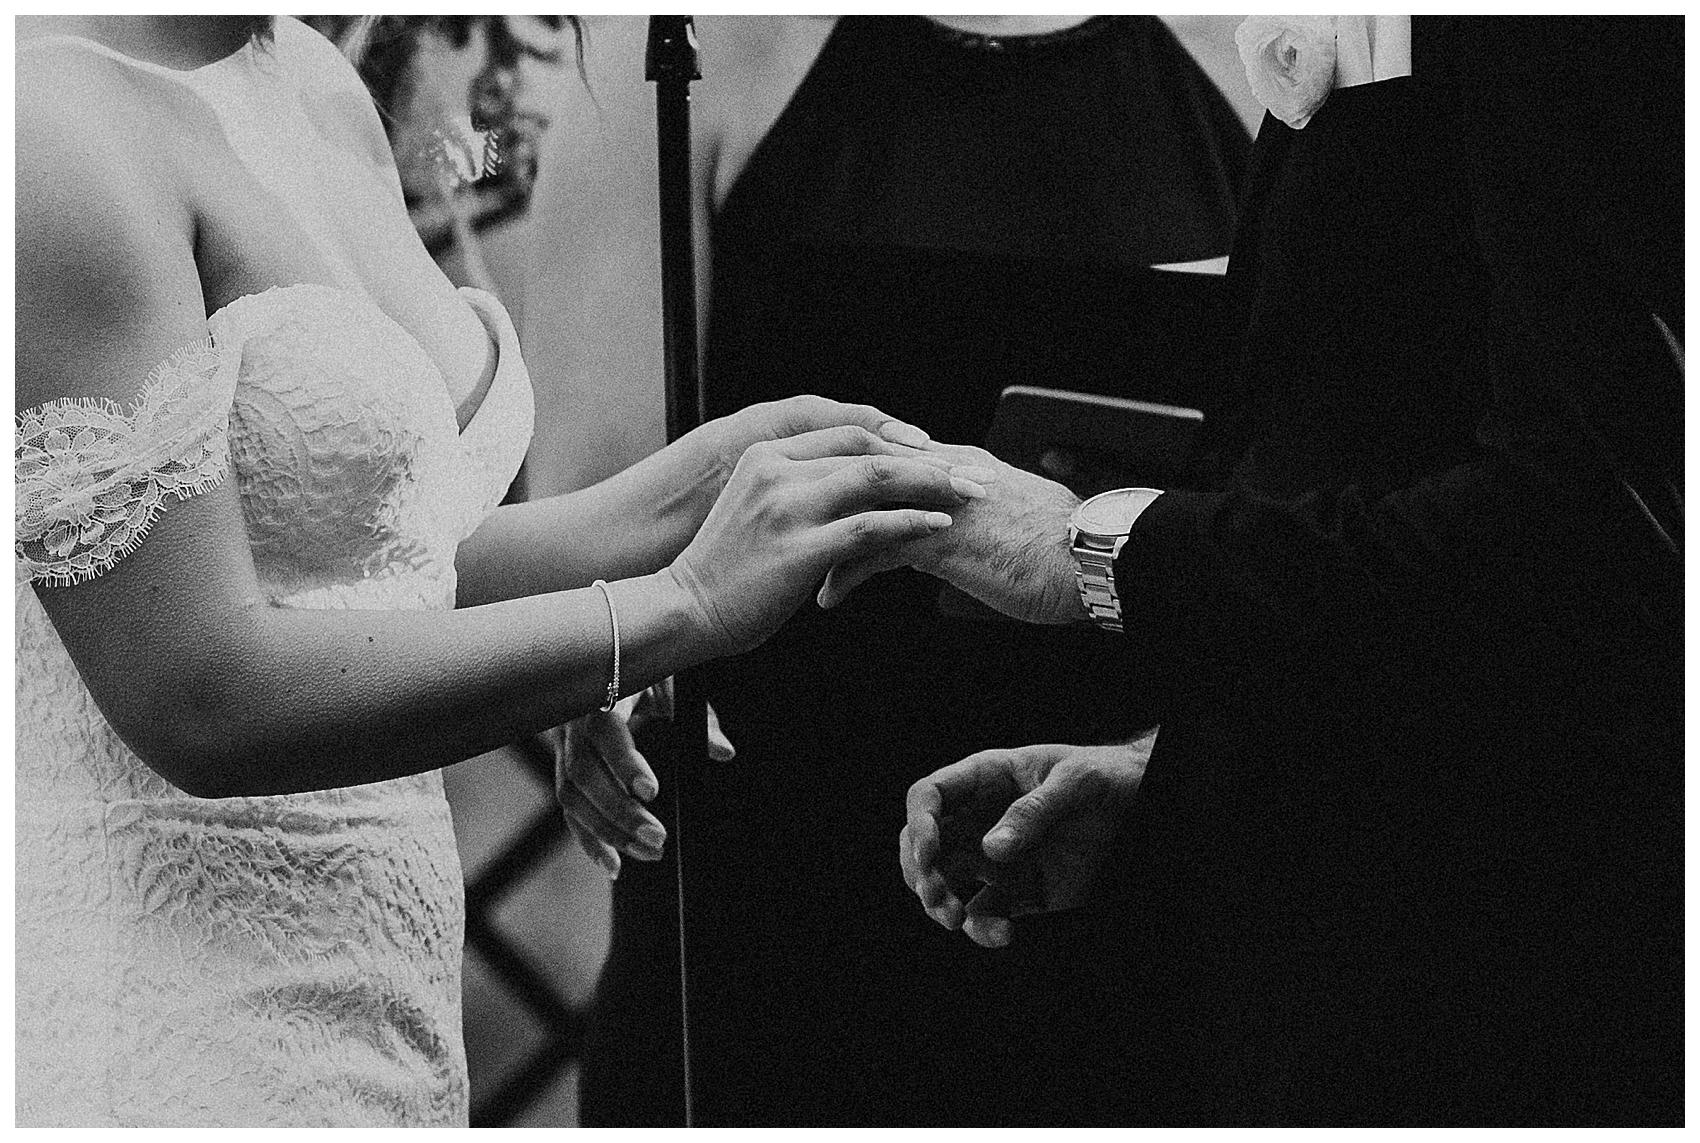 Chateau Rive Spokane Wedding Cassie Trottier Photography01058.jpg